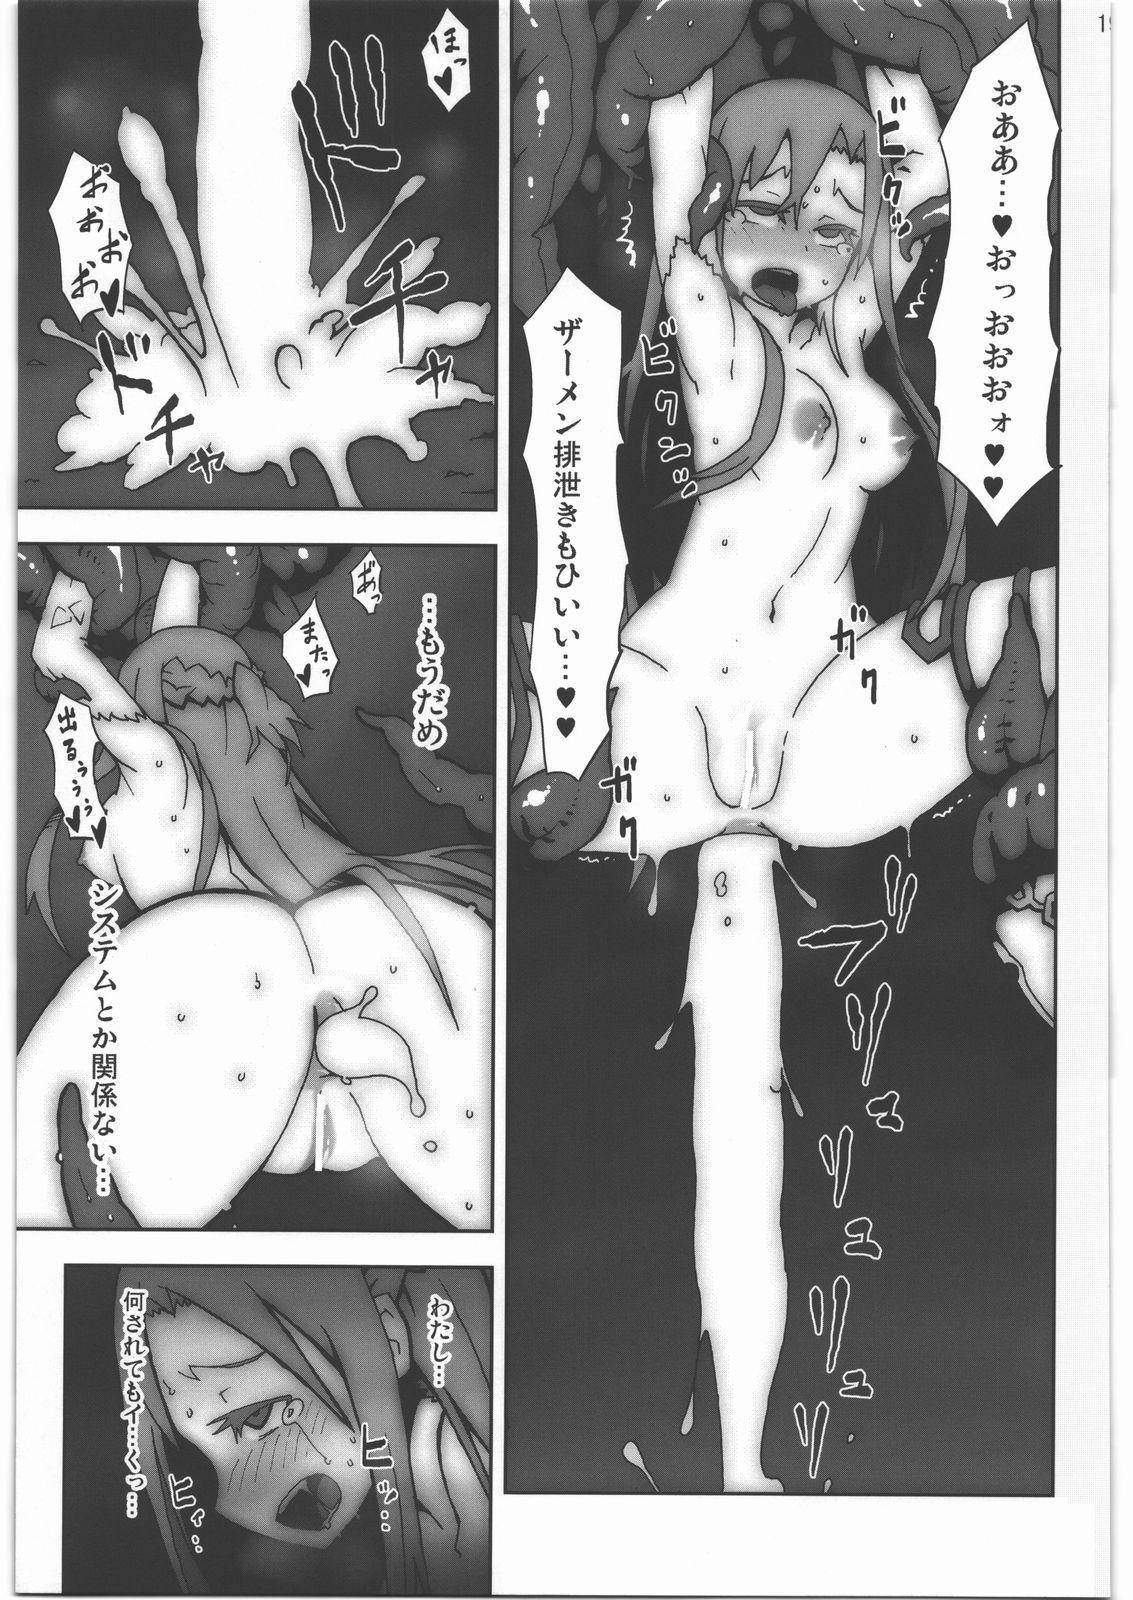 Asuna no Shokushu Party Ryoujoku Zeme Online 17